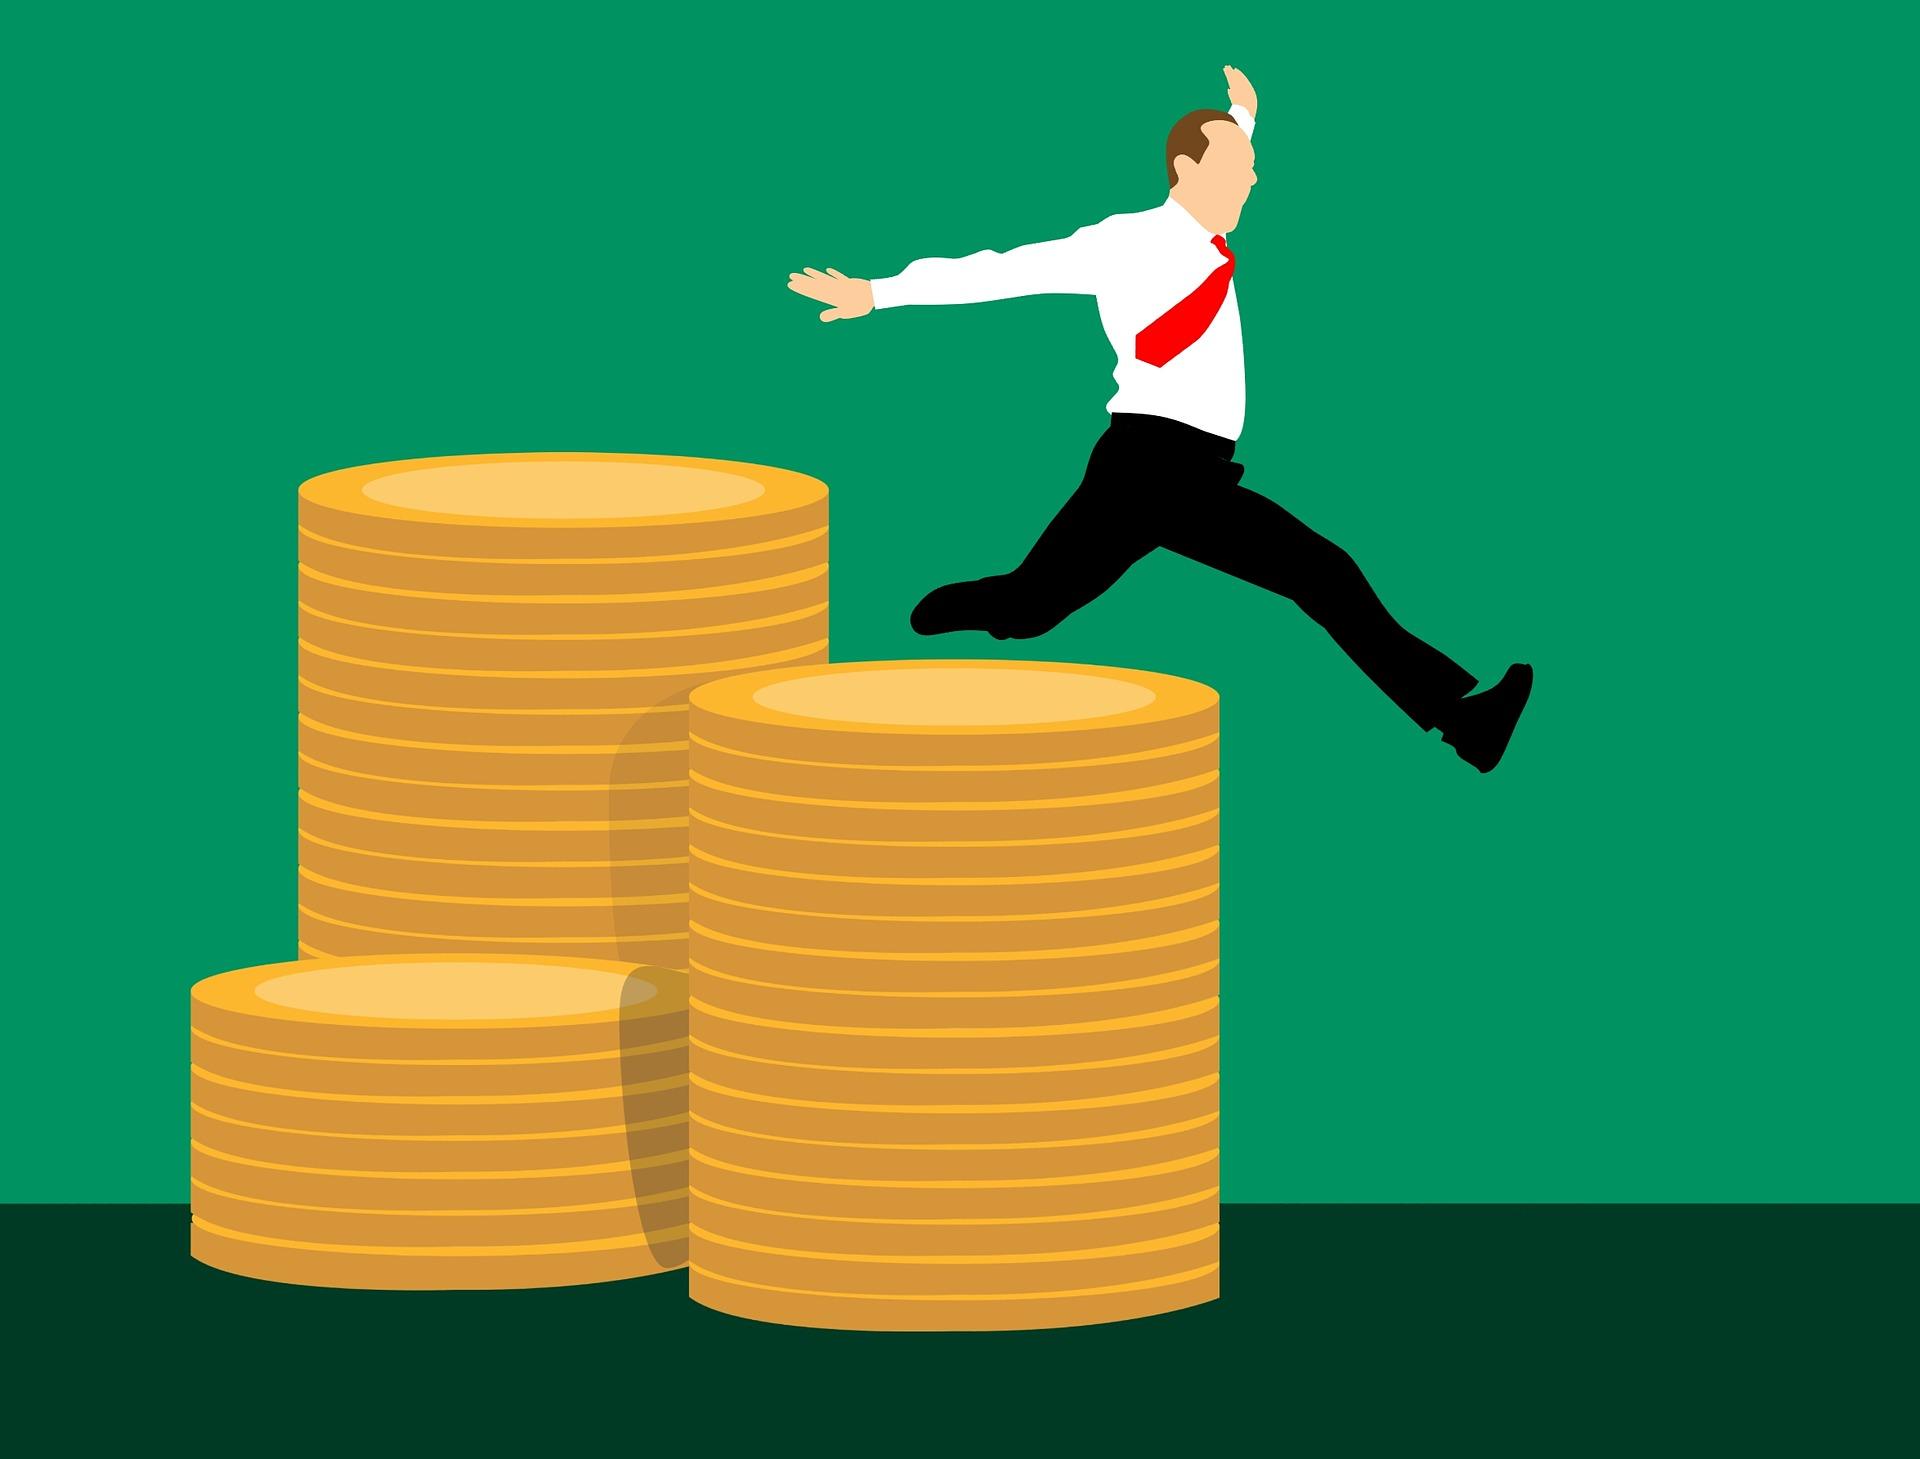 capital-vinancing-startups